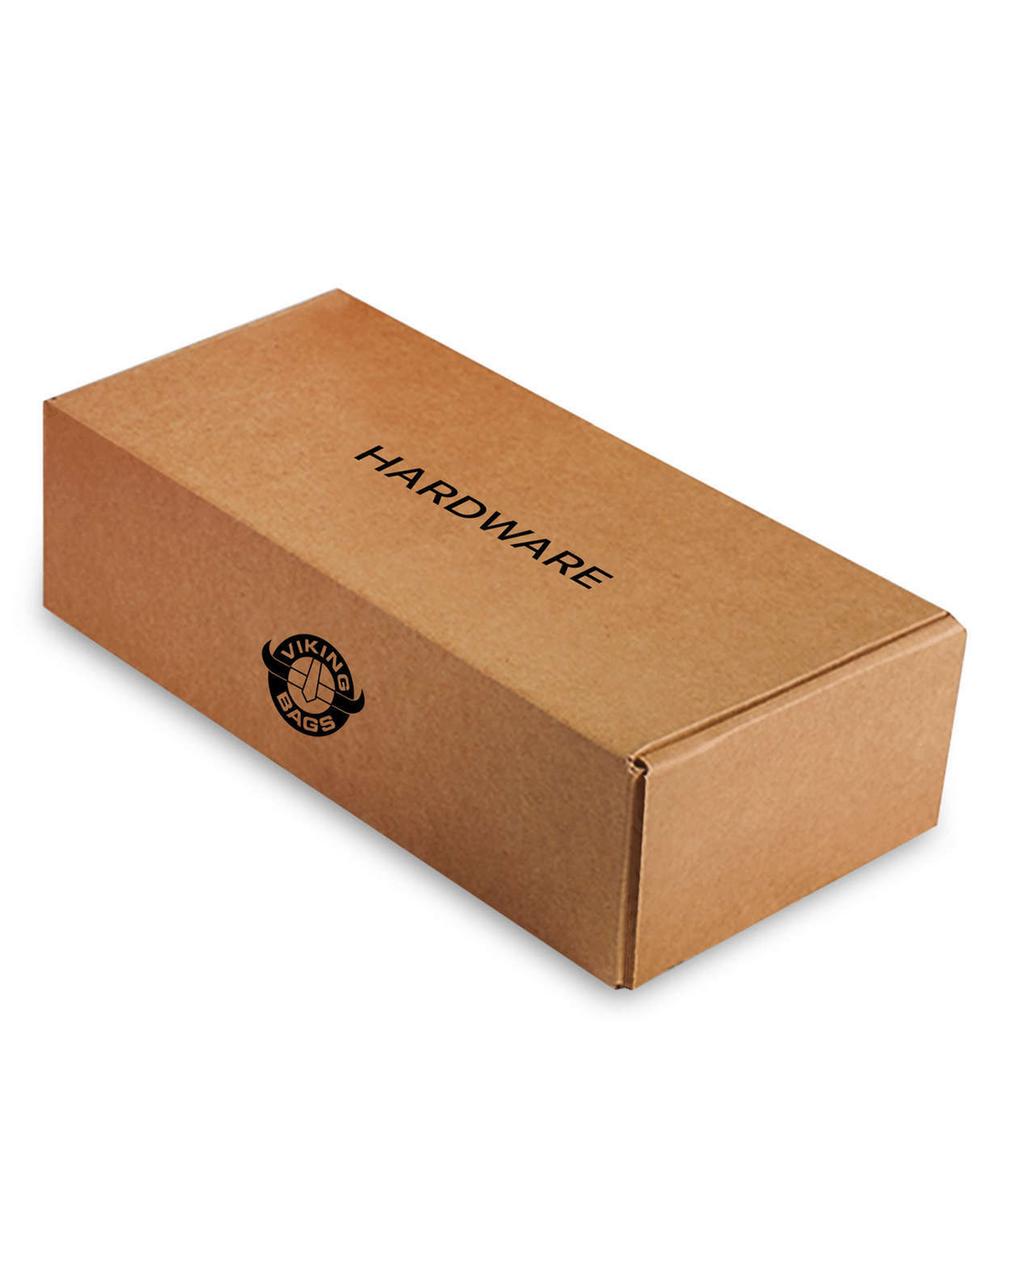 Honda 750 Shadow Phantom SS Side Pocket Large Motorcycle Saddlebags box